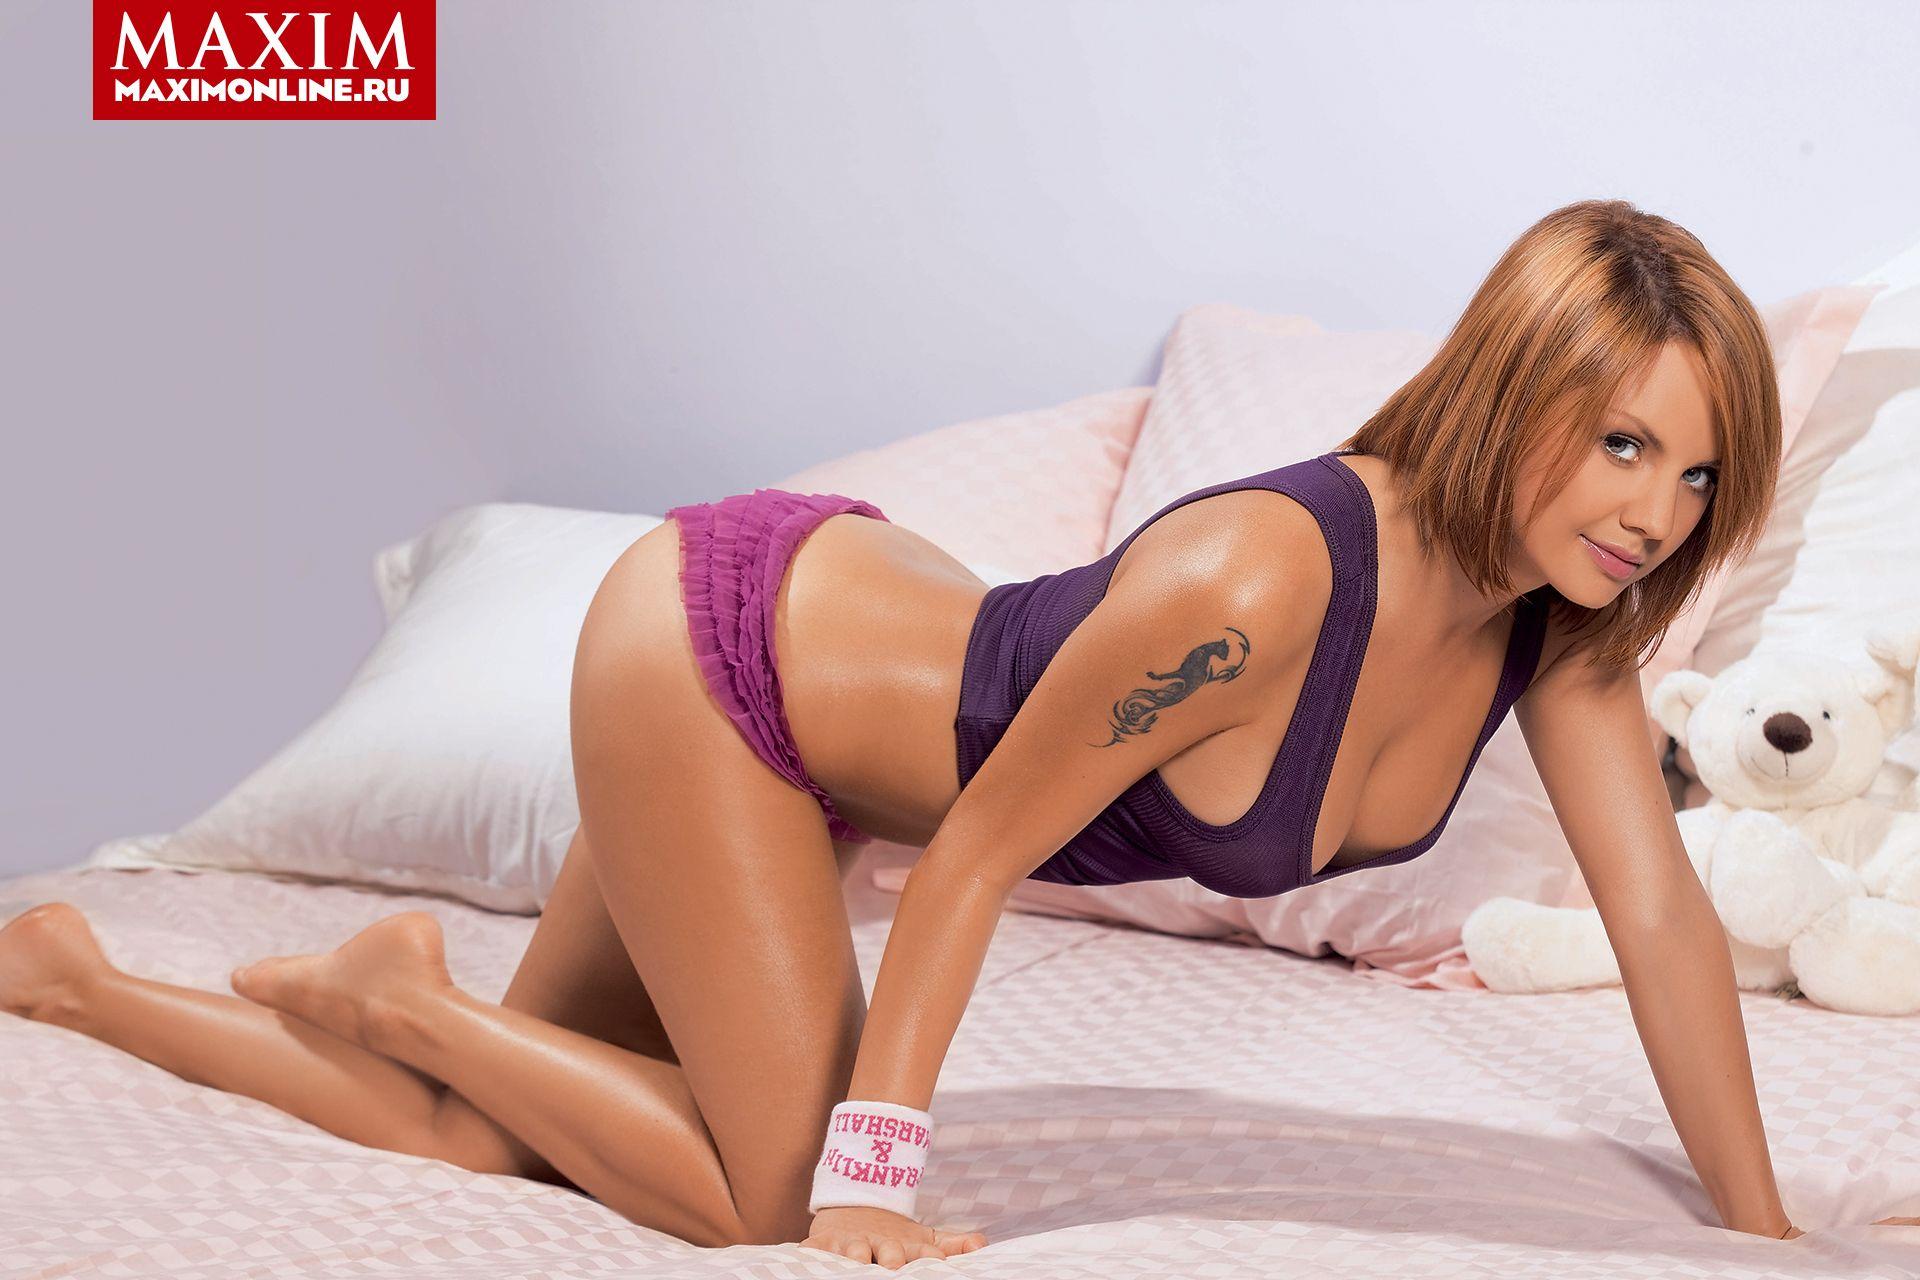 Maxim russia maksim maximrussia maxim maksim more https hot girls with tattoos hq wallpapers voltagebd Images